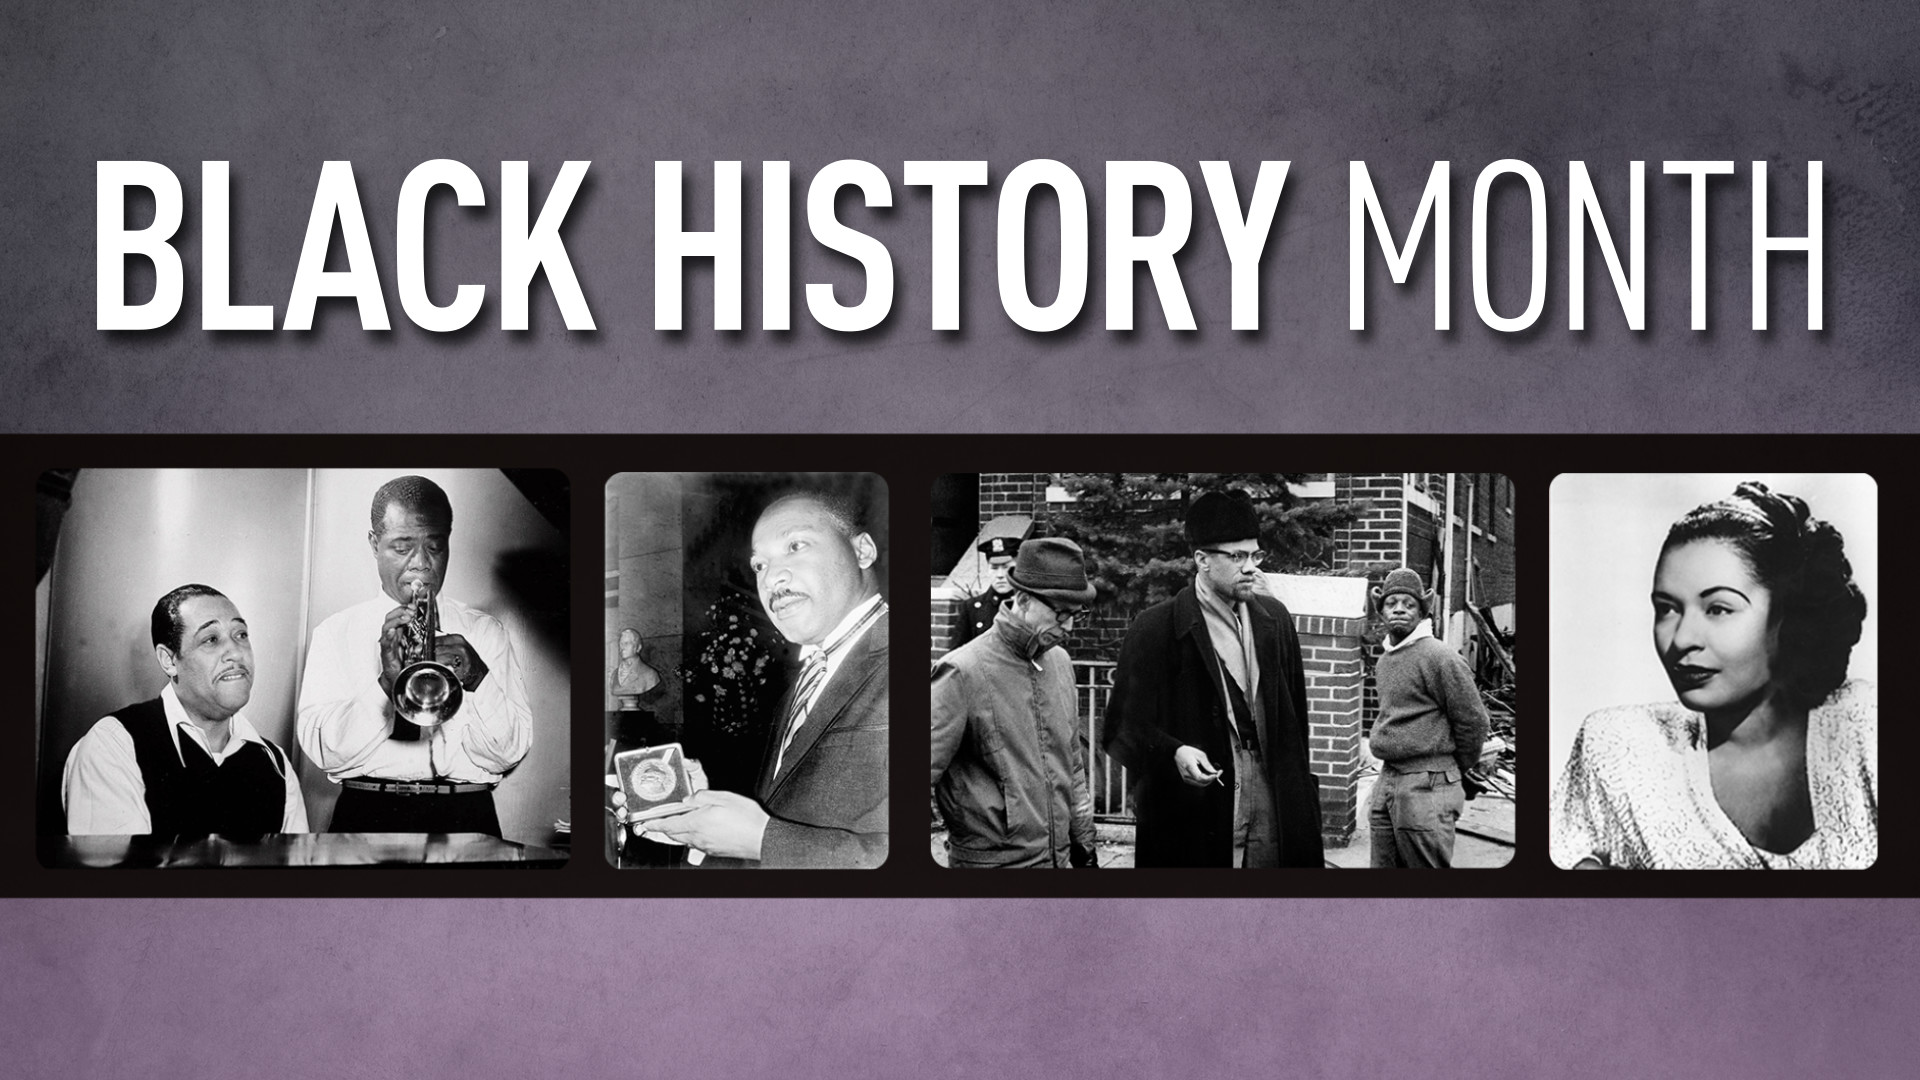 black history month wallpaper 72 images